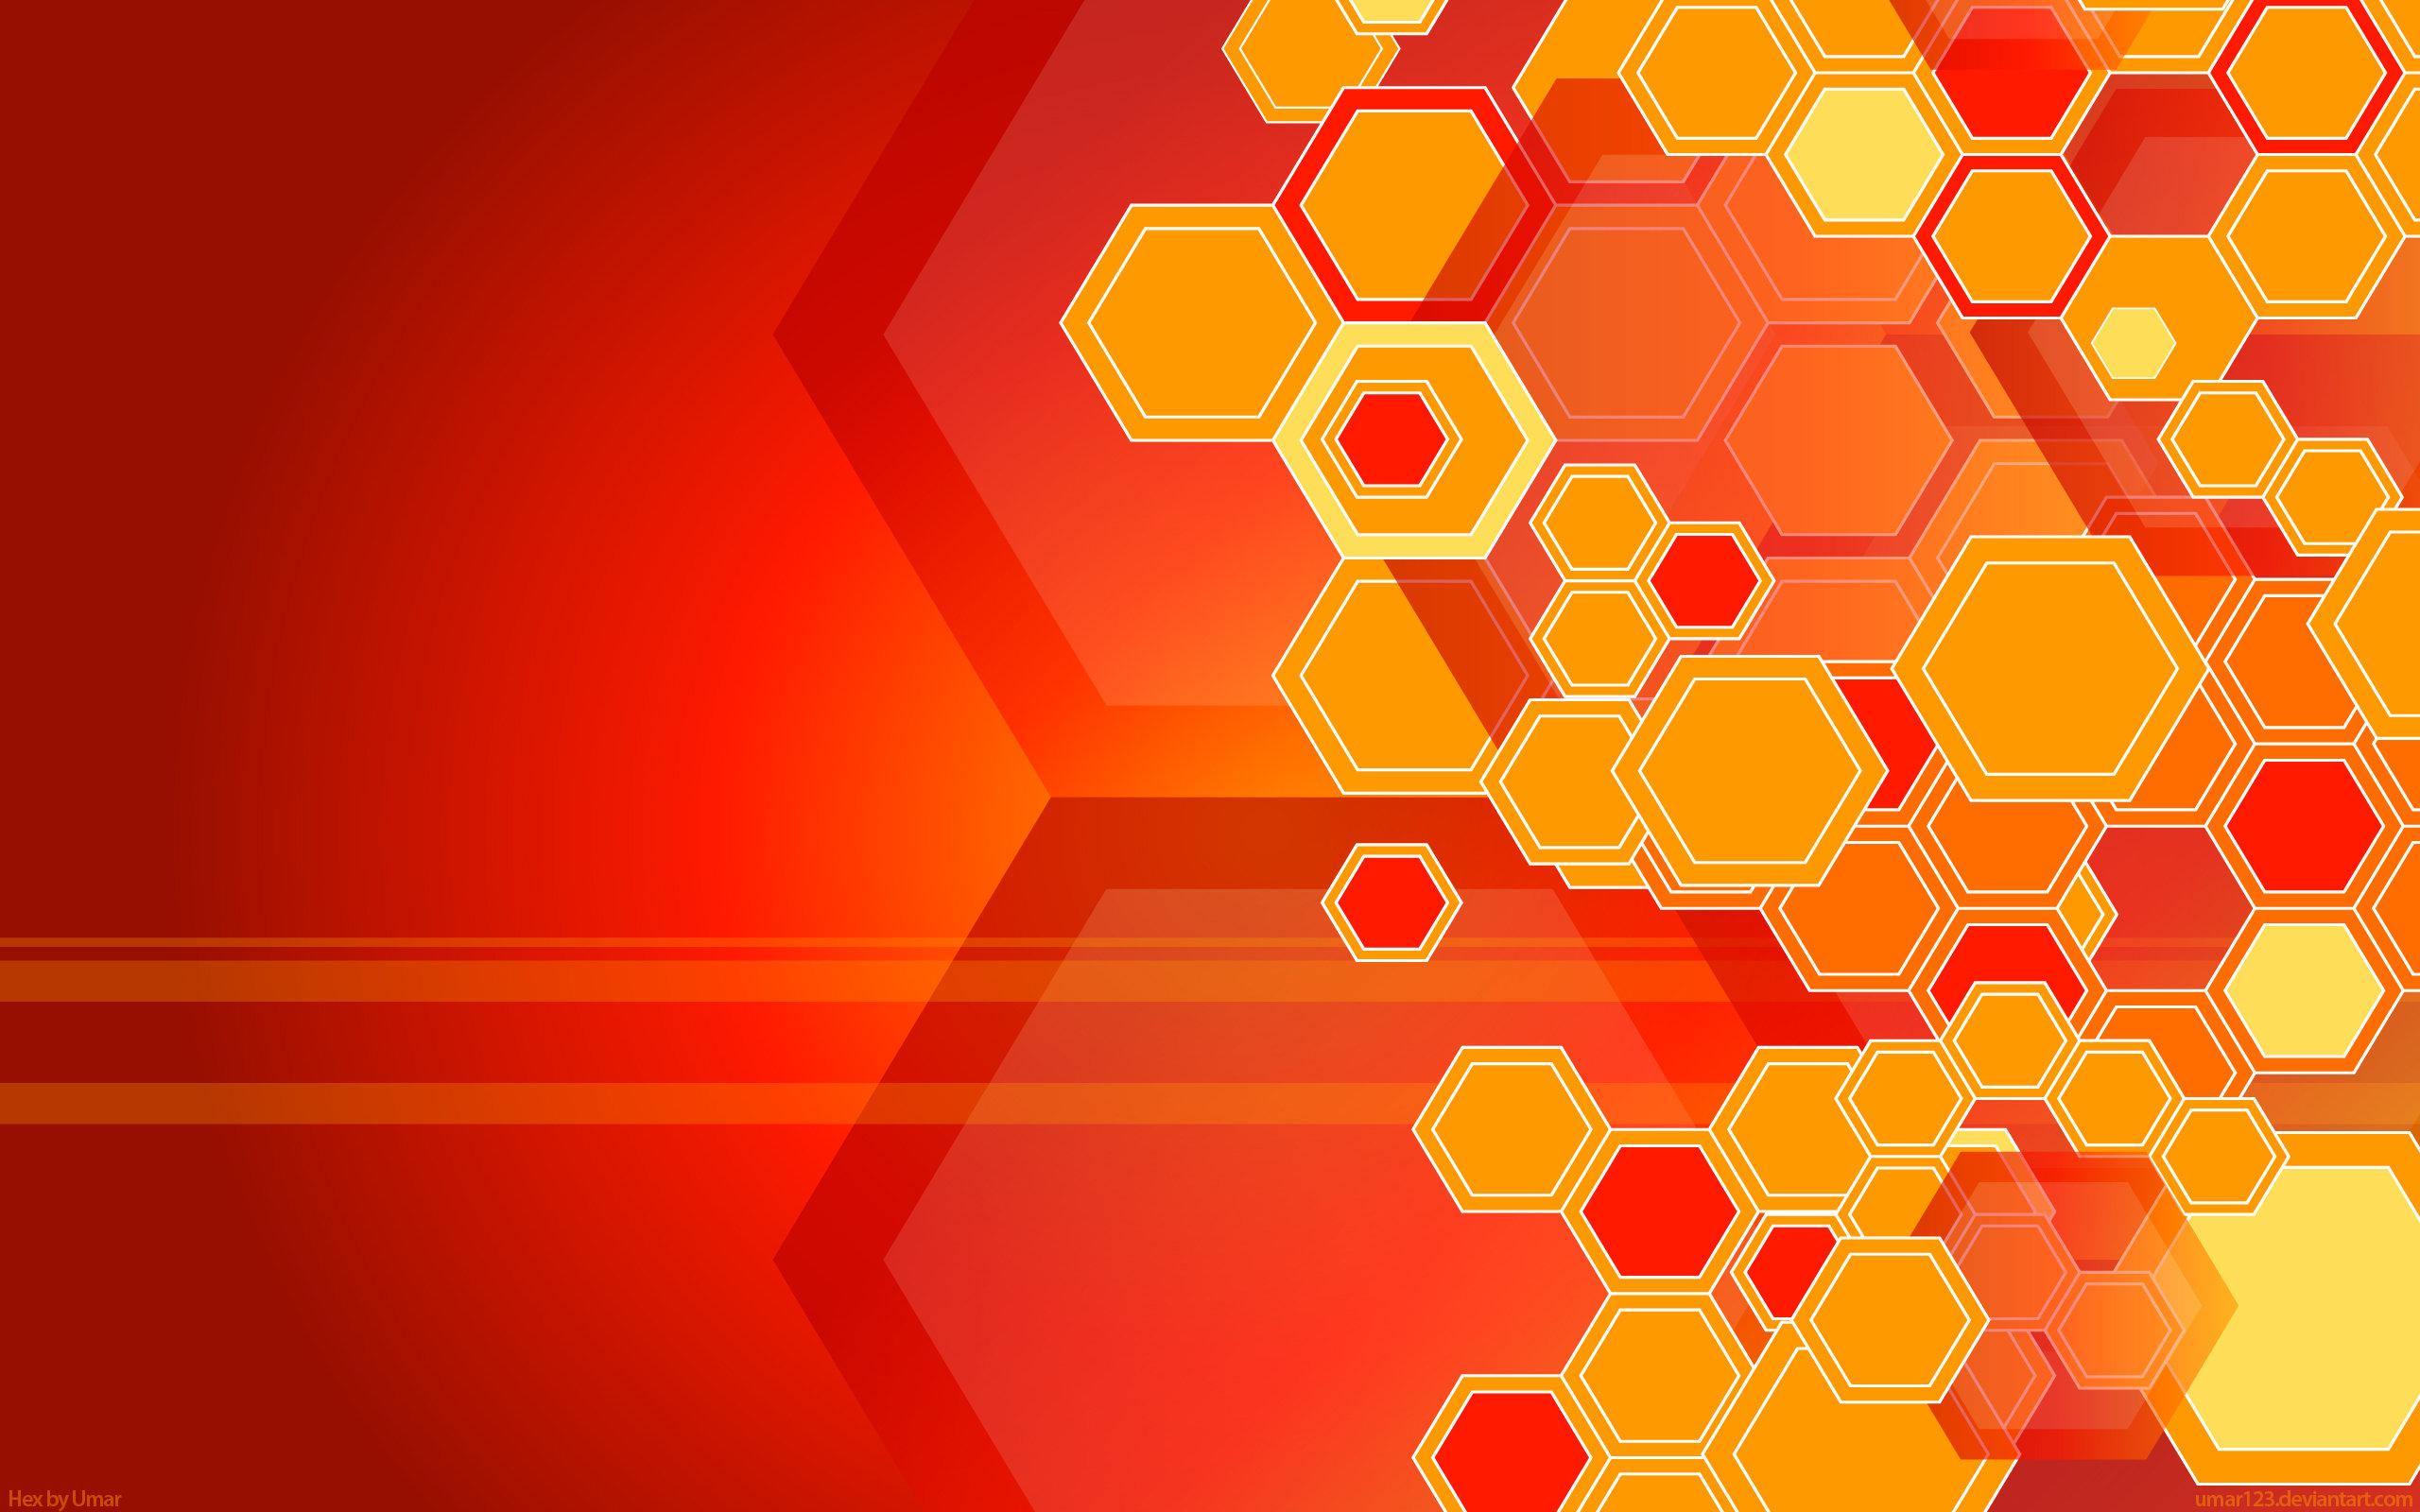 Periodic table black background wallpaper - Red Hexagon Wallpaper Wallpapersafari